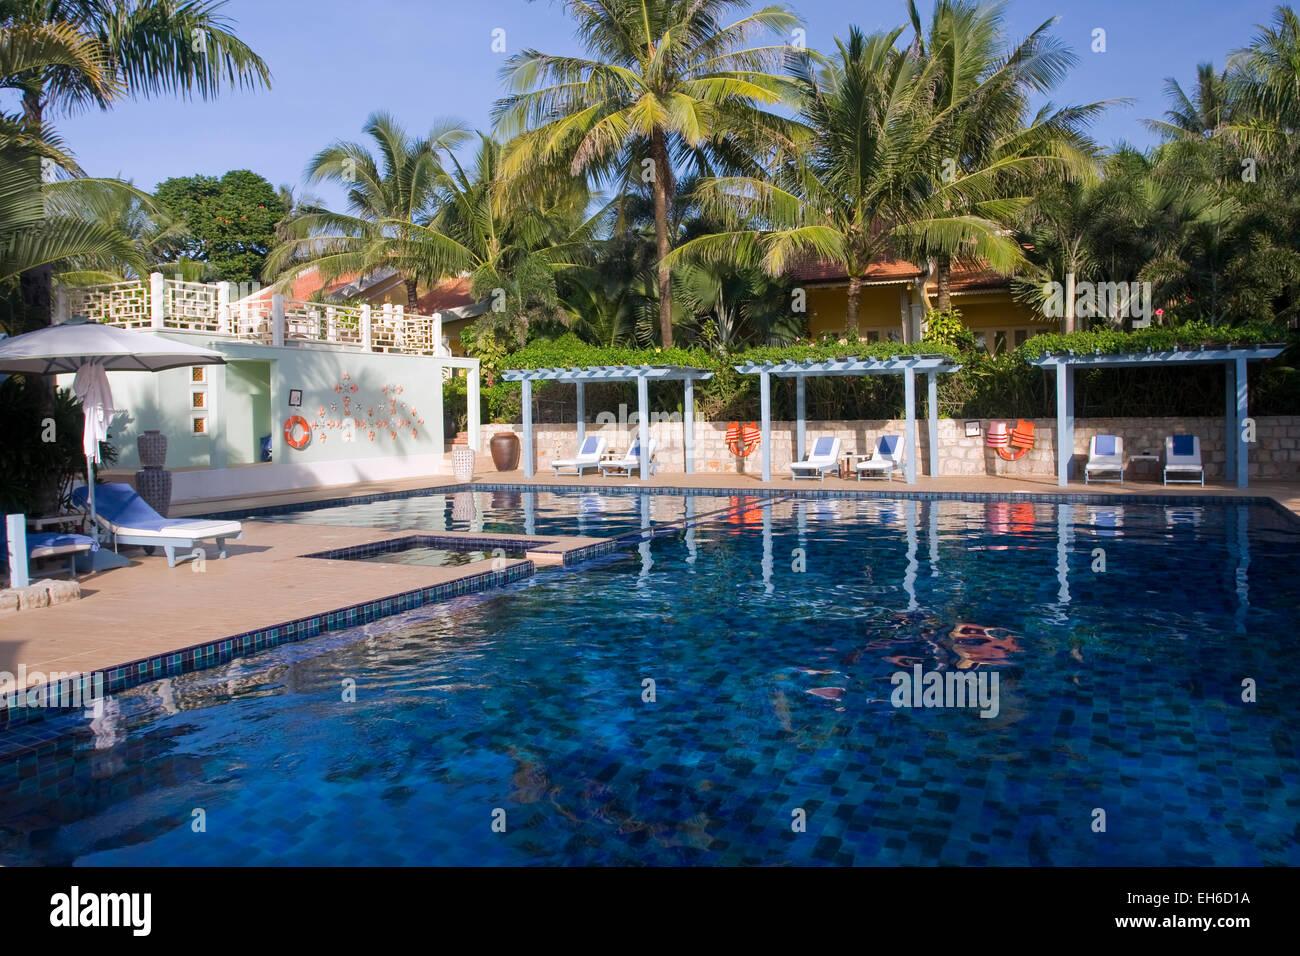 Hotel La Veranda at Long beach on the island Phu Quoc, Vietnam, Asia Stock Photo